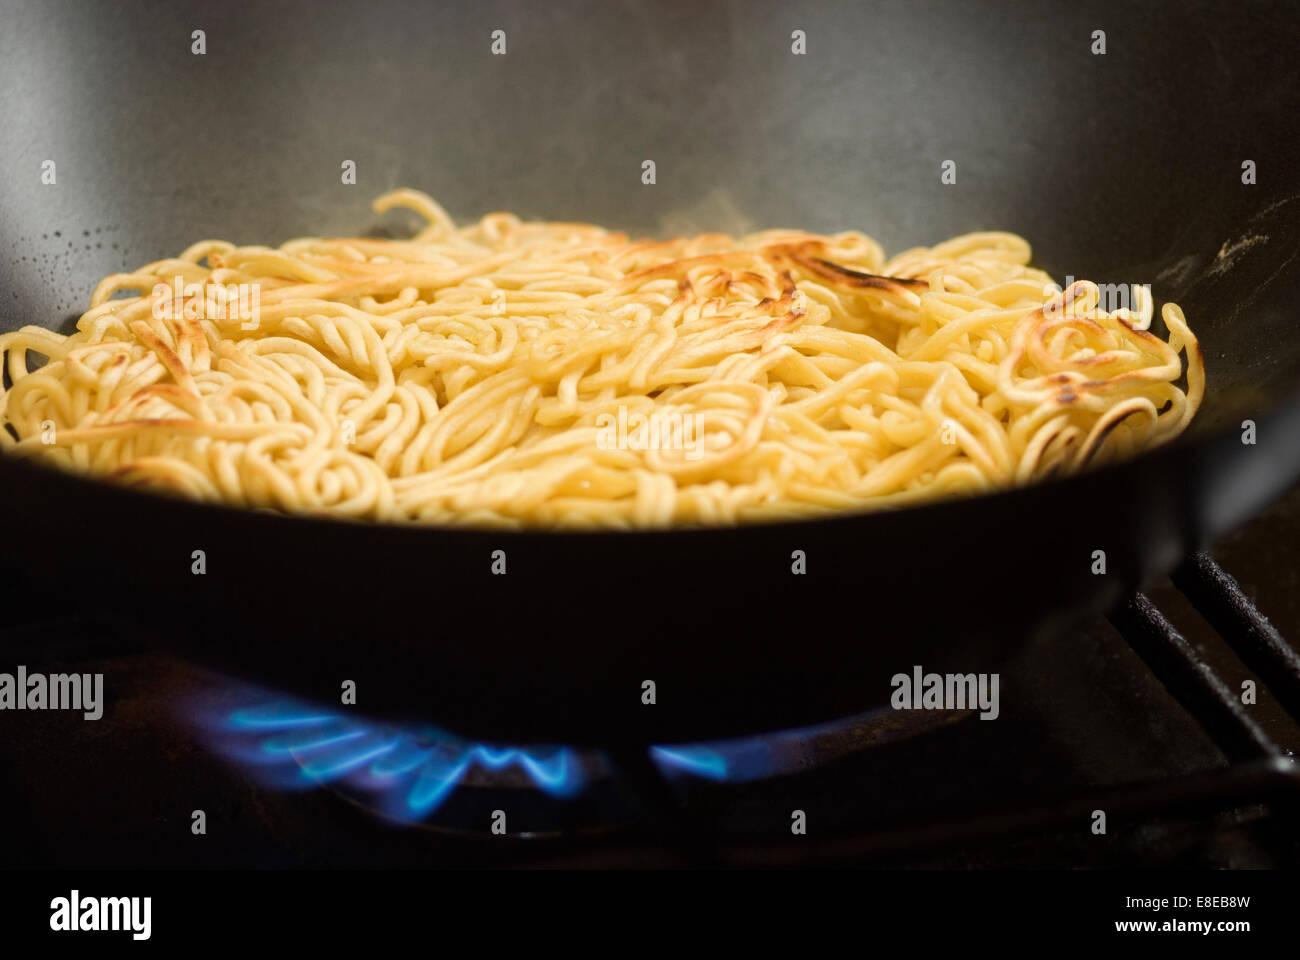 Fried Chicken Egg Noodles - Stock Image